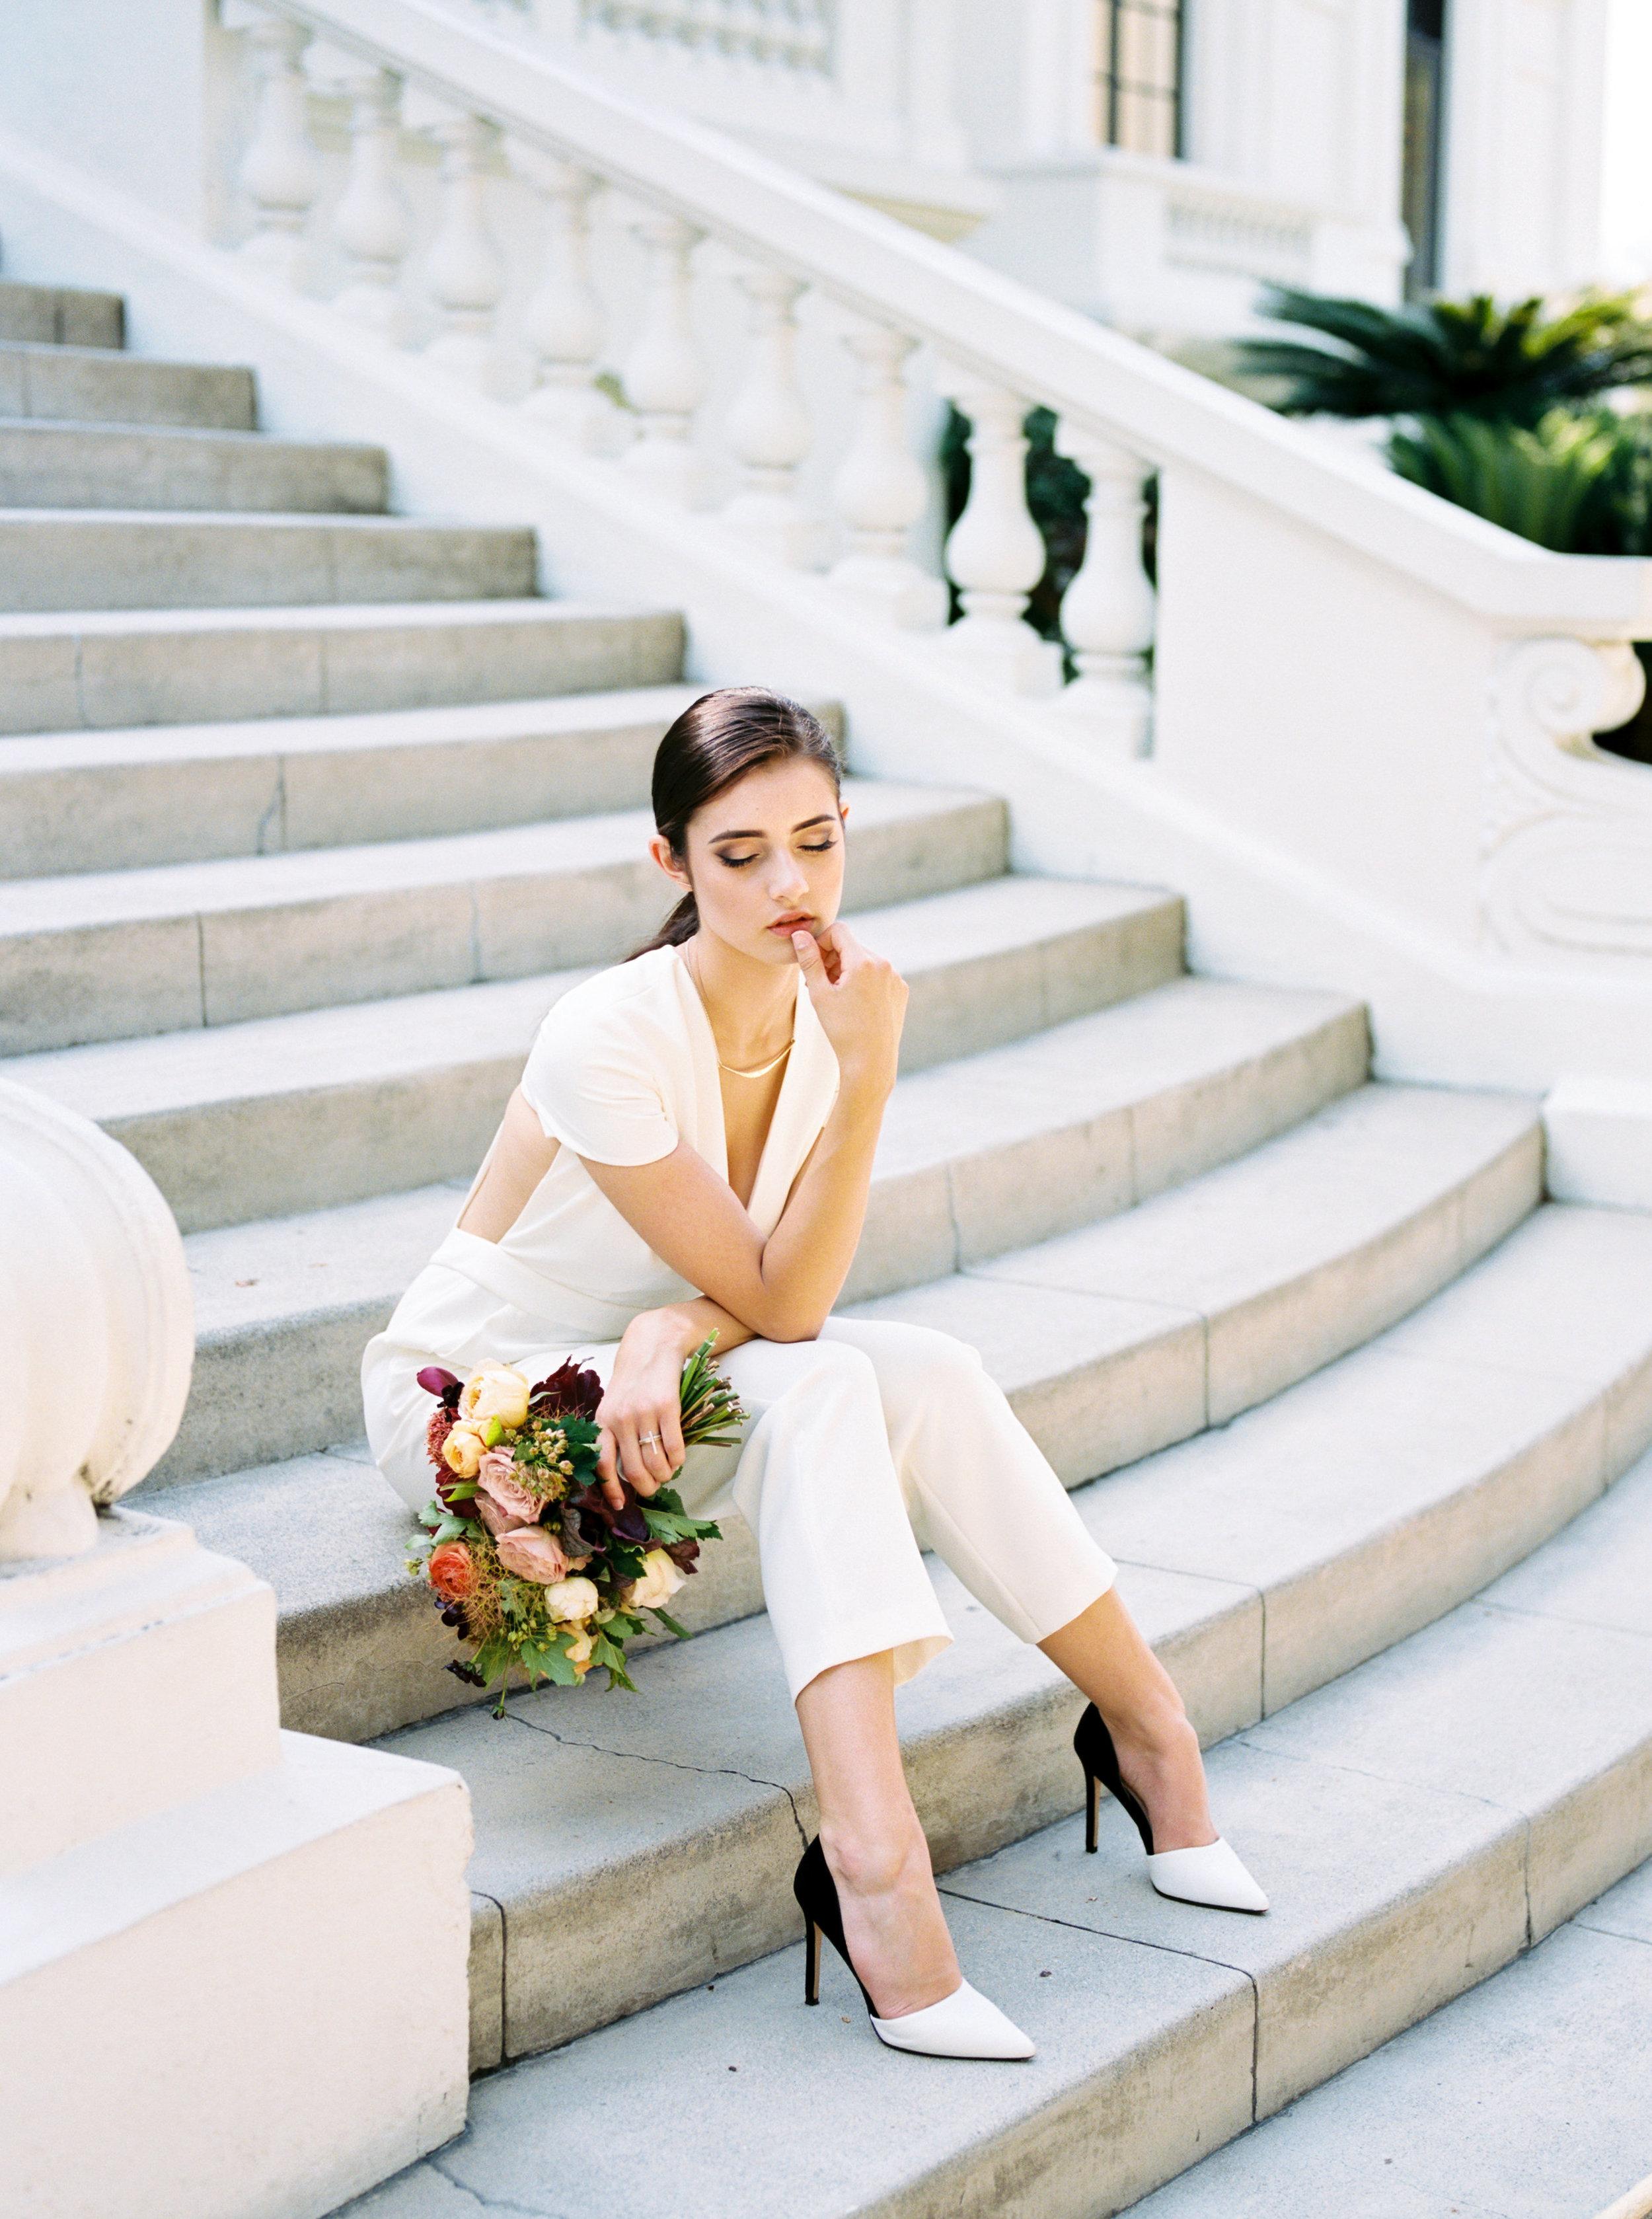 Bride wearing Delphine Manivet pantsuit for her private estate wedding in Pasadena, California